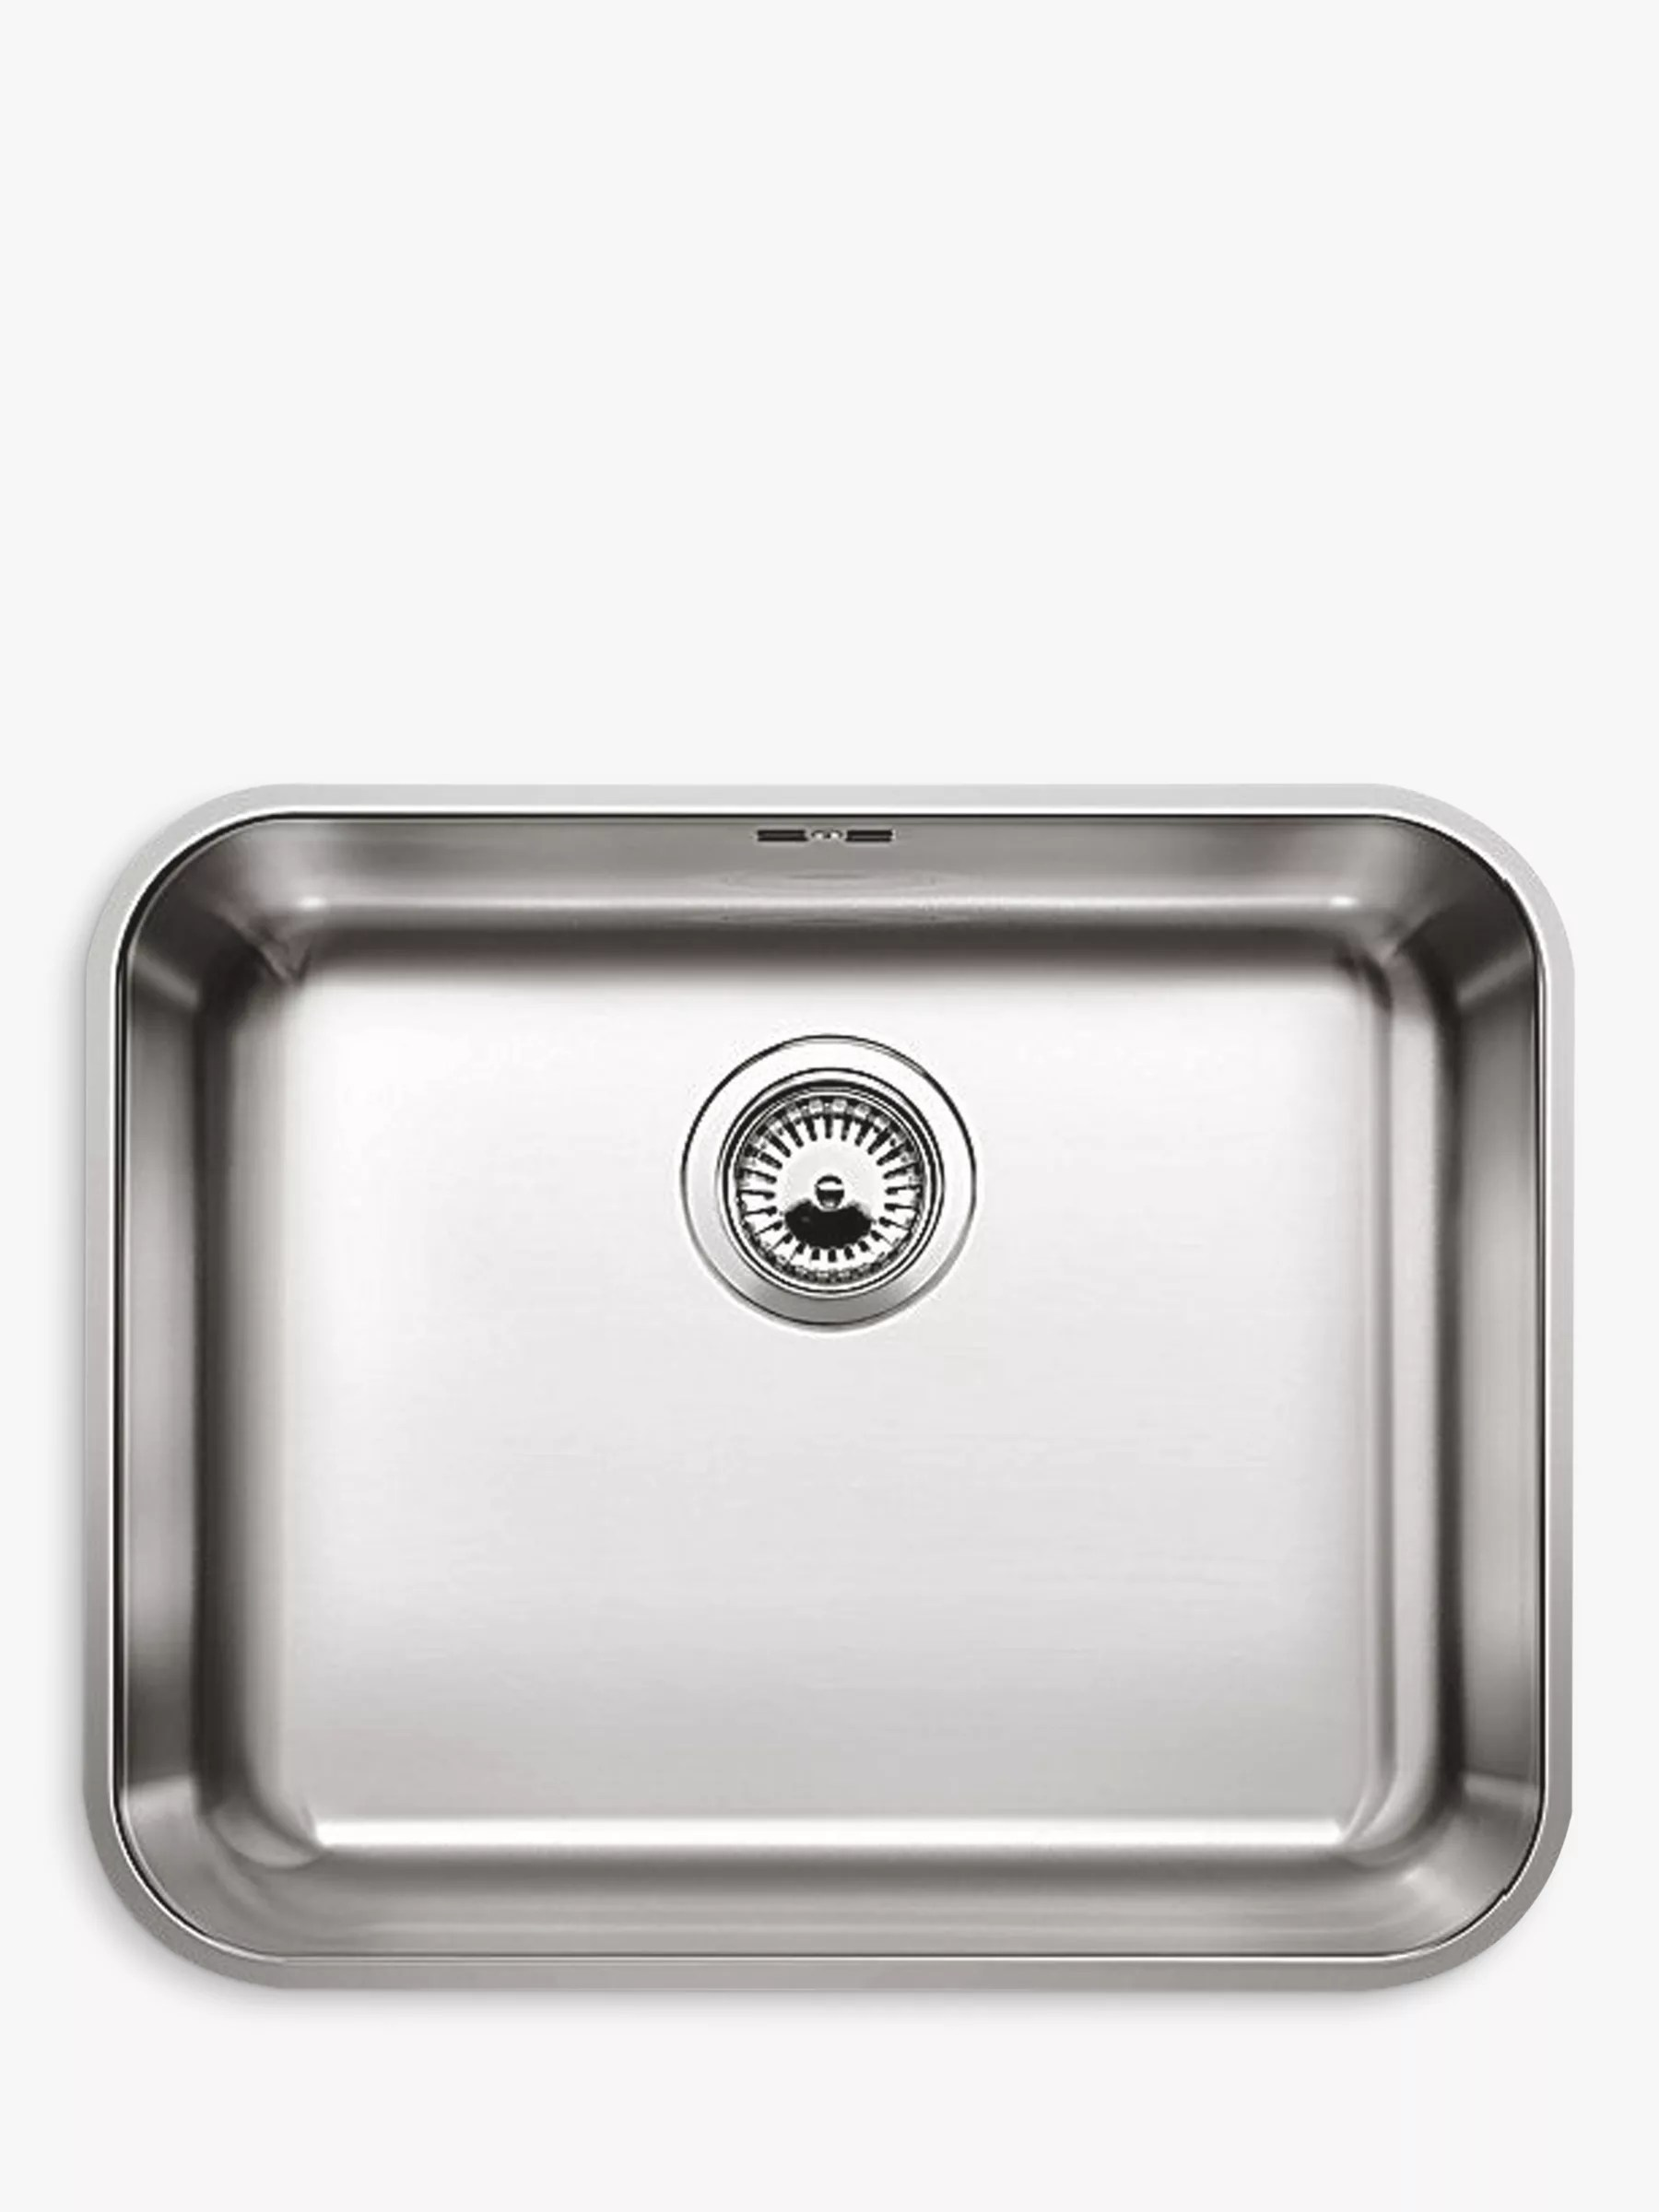 Blanco Supra 500 U Single Bowl Undermounted Kitchen Sink